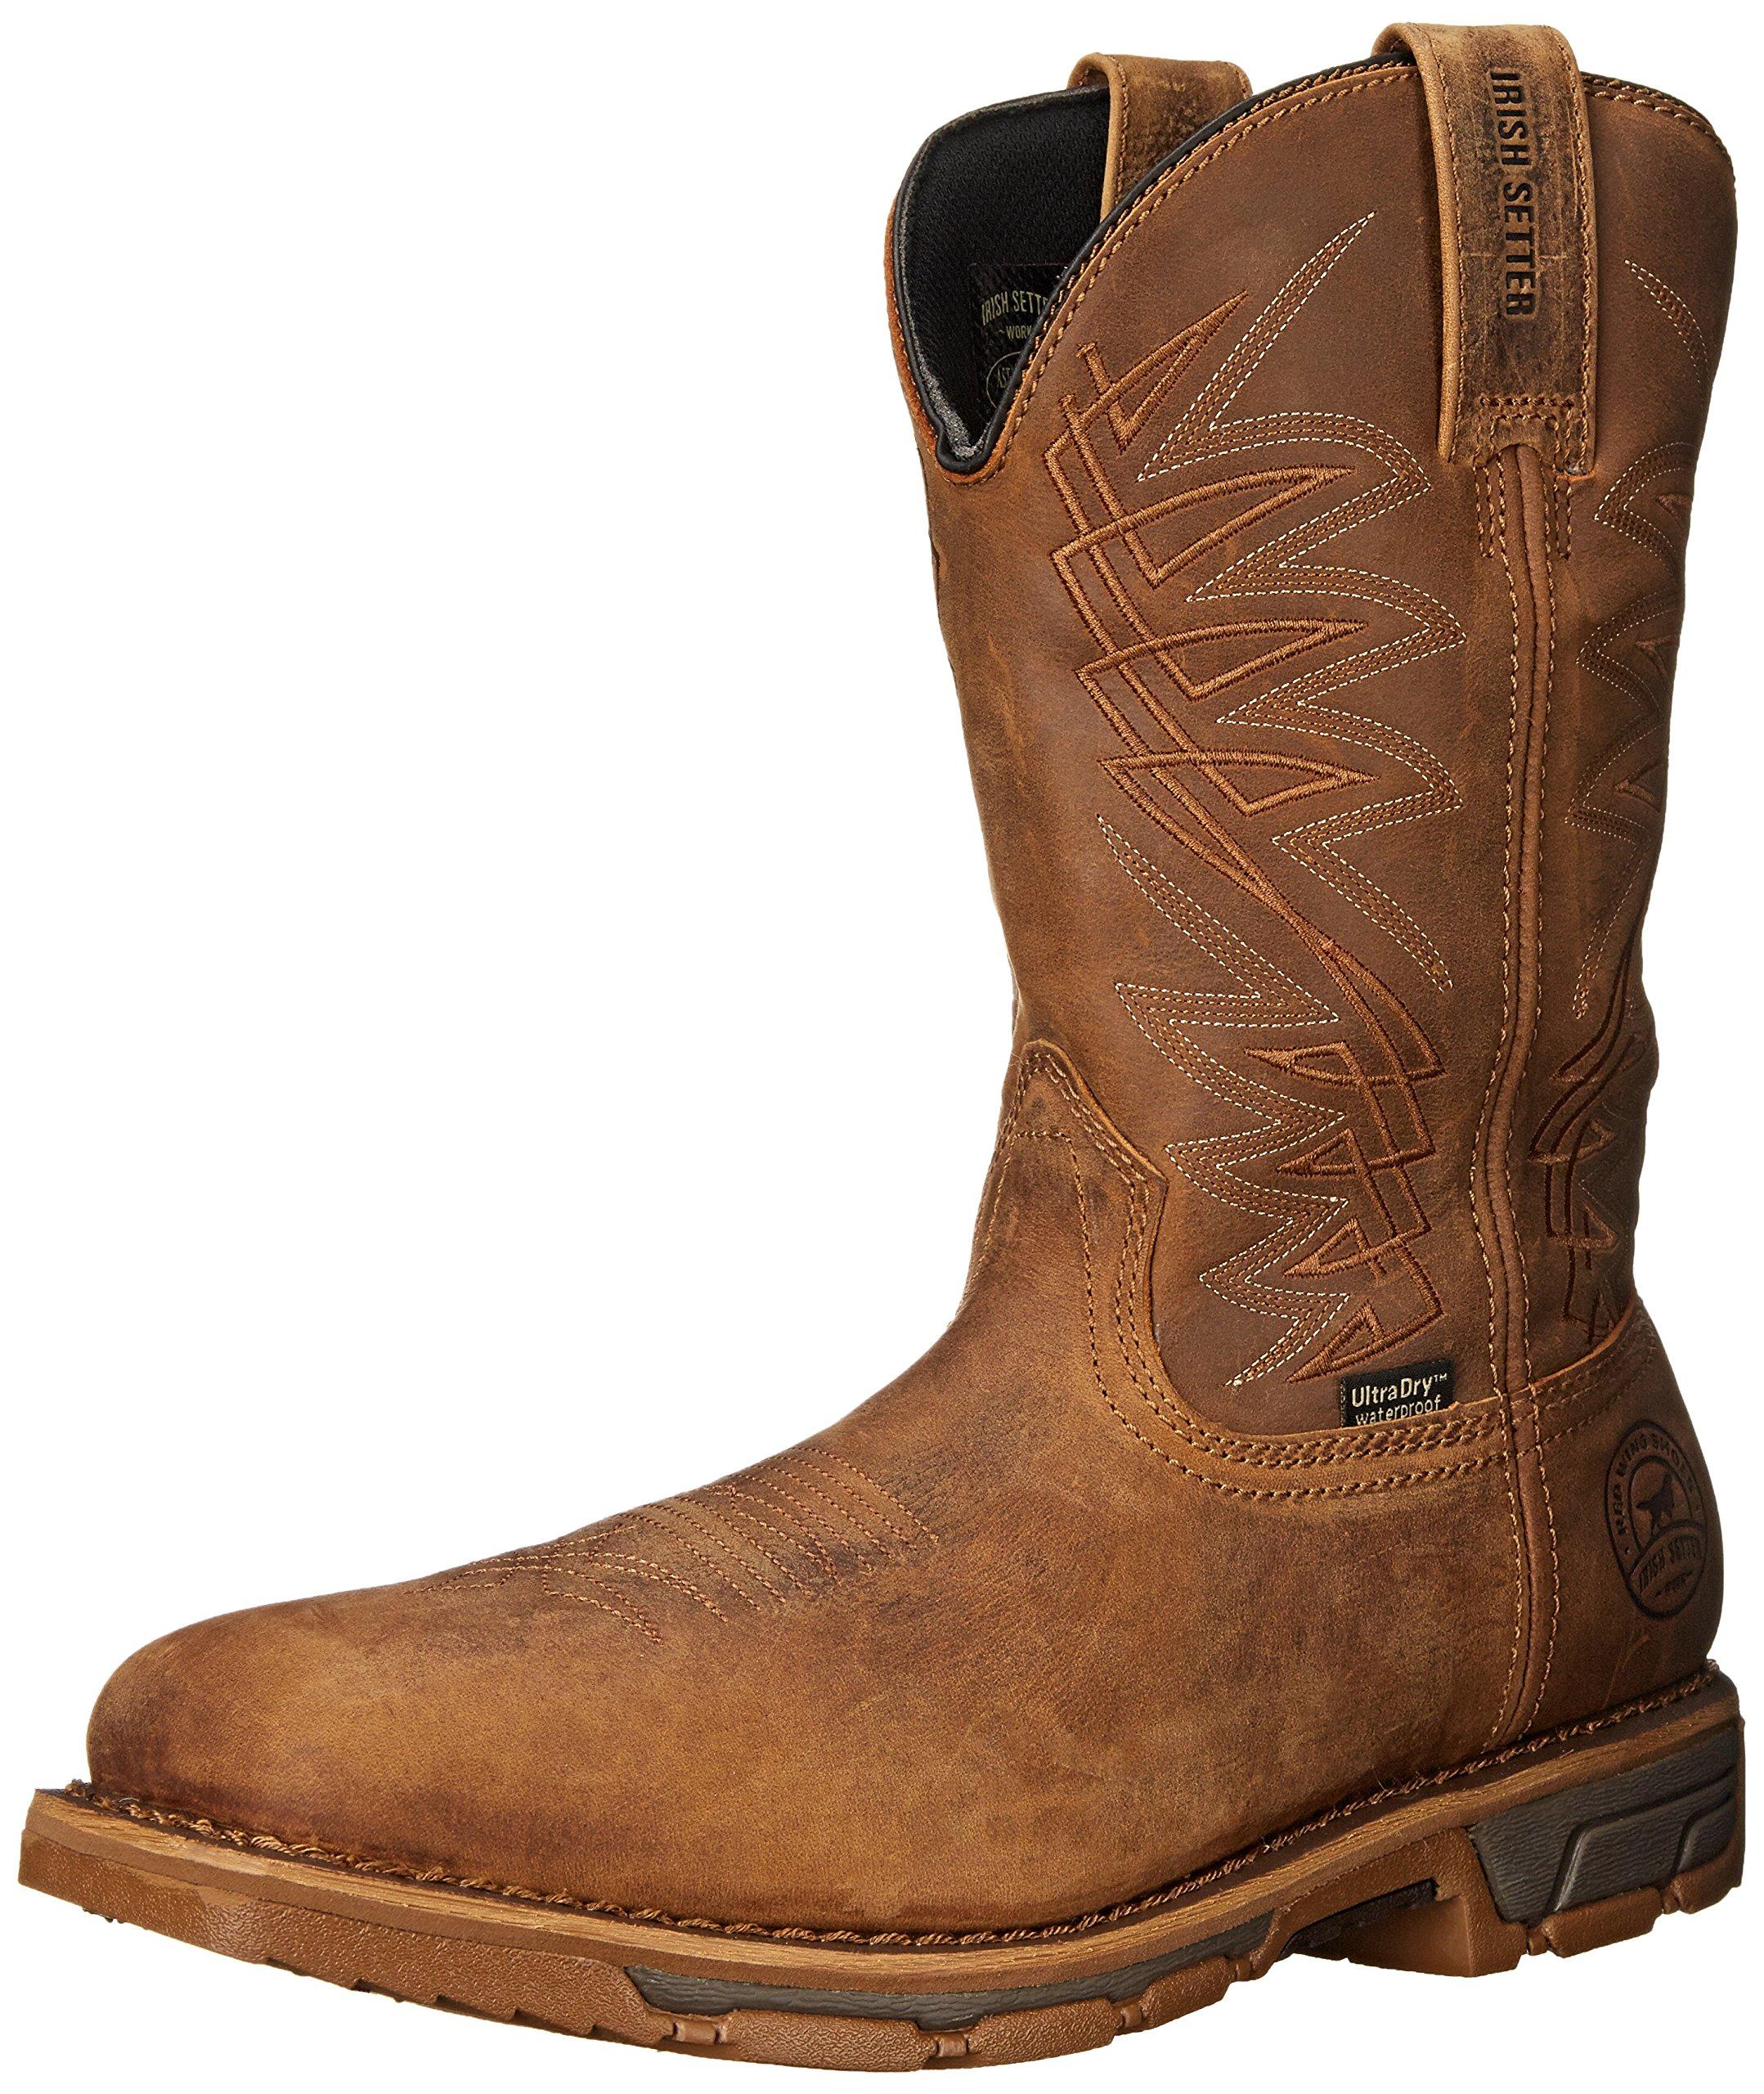 Irish Setter Work Men's Marshall 11'' Pull-on Square Toe Boot, Brown, 12 D US